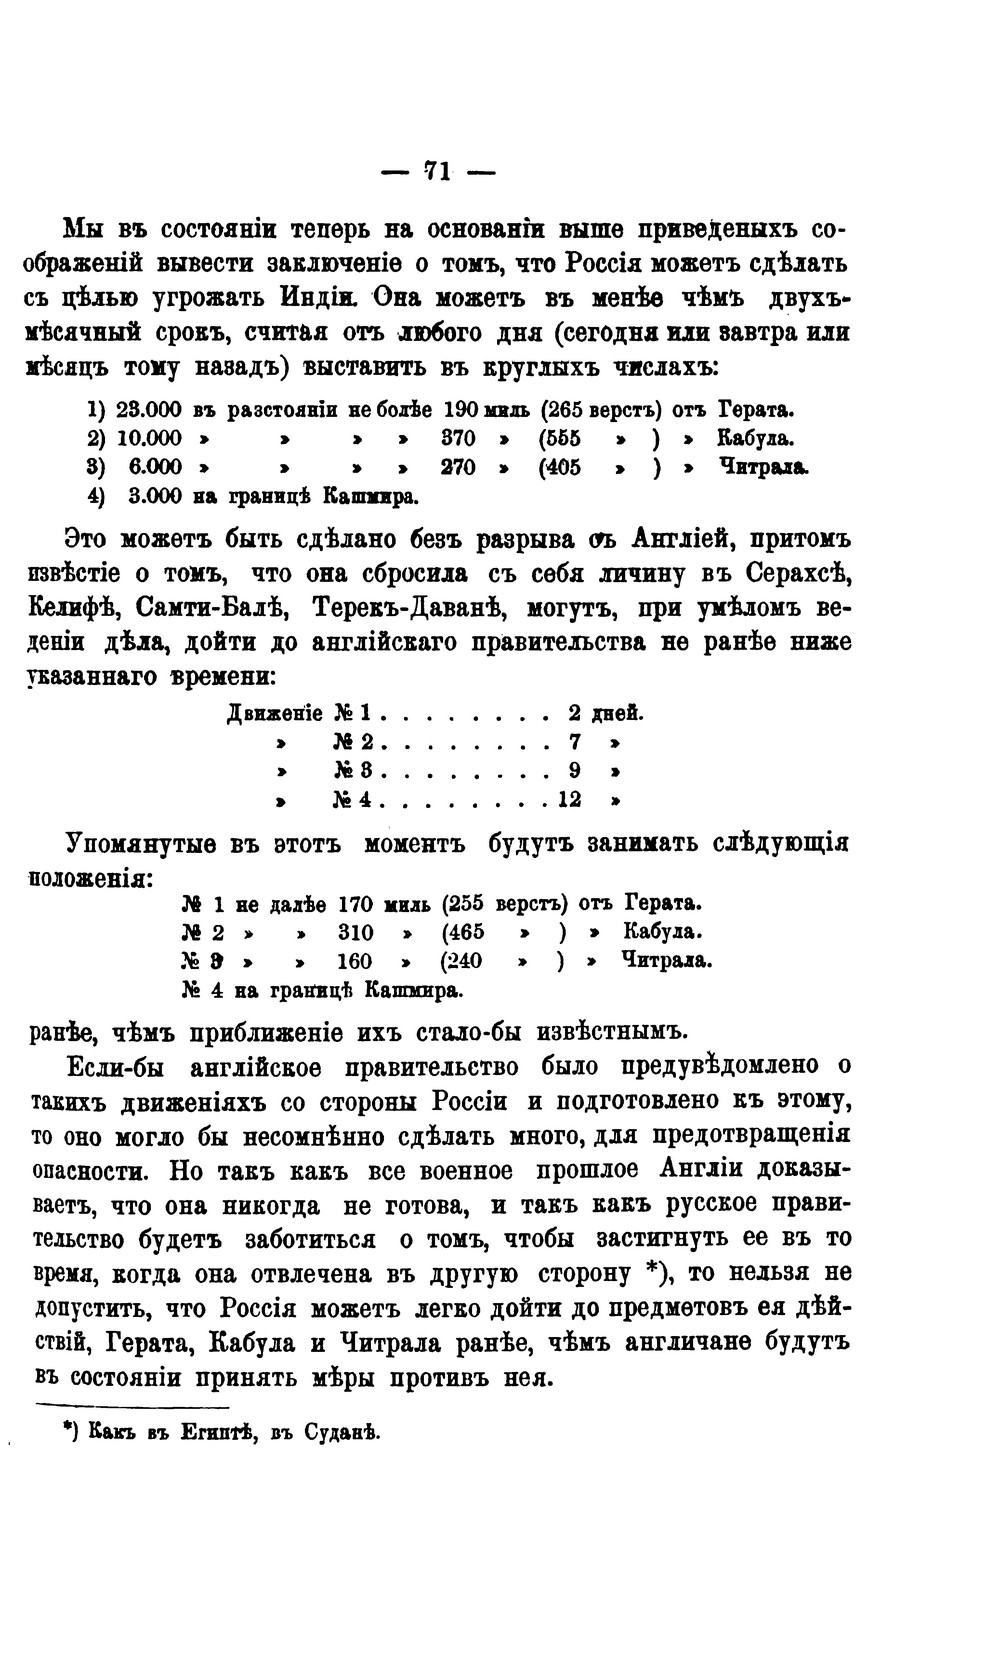 http://i1.imageban.ru/out/2013/08/29/b230177556e511261cb0a51d6283ef49.jpg